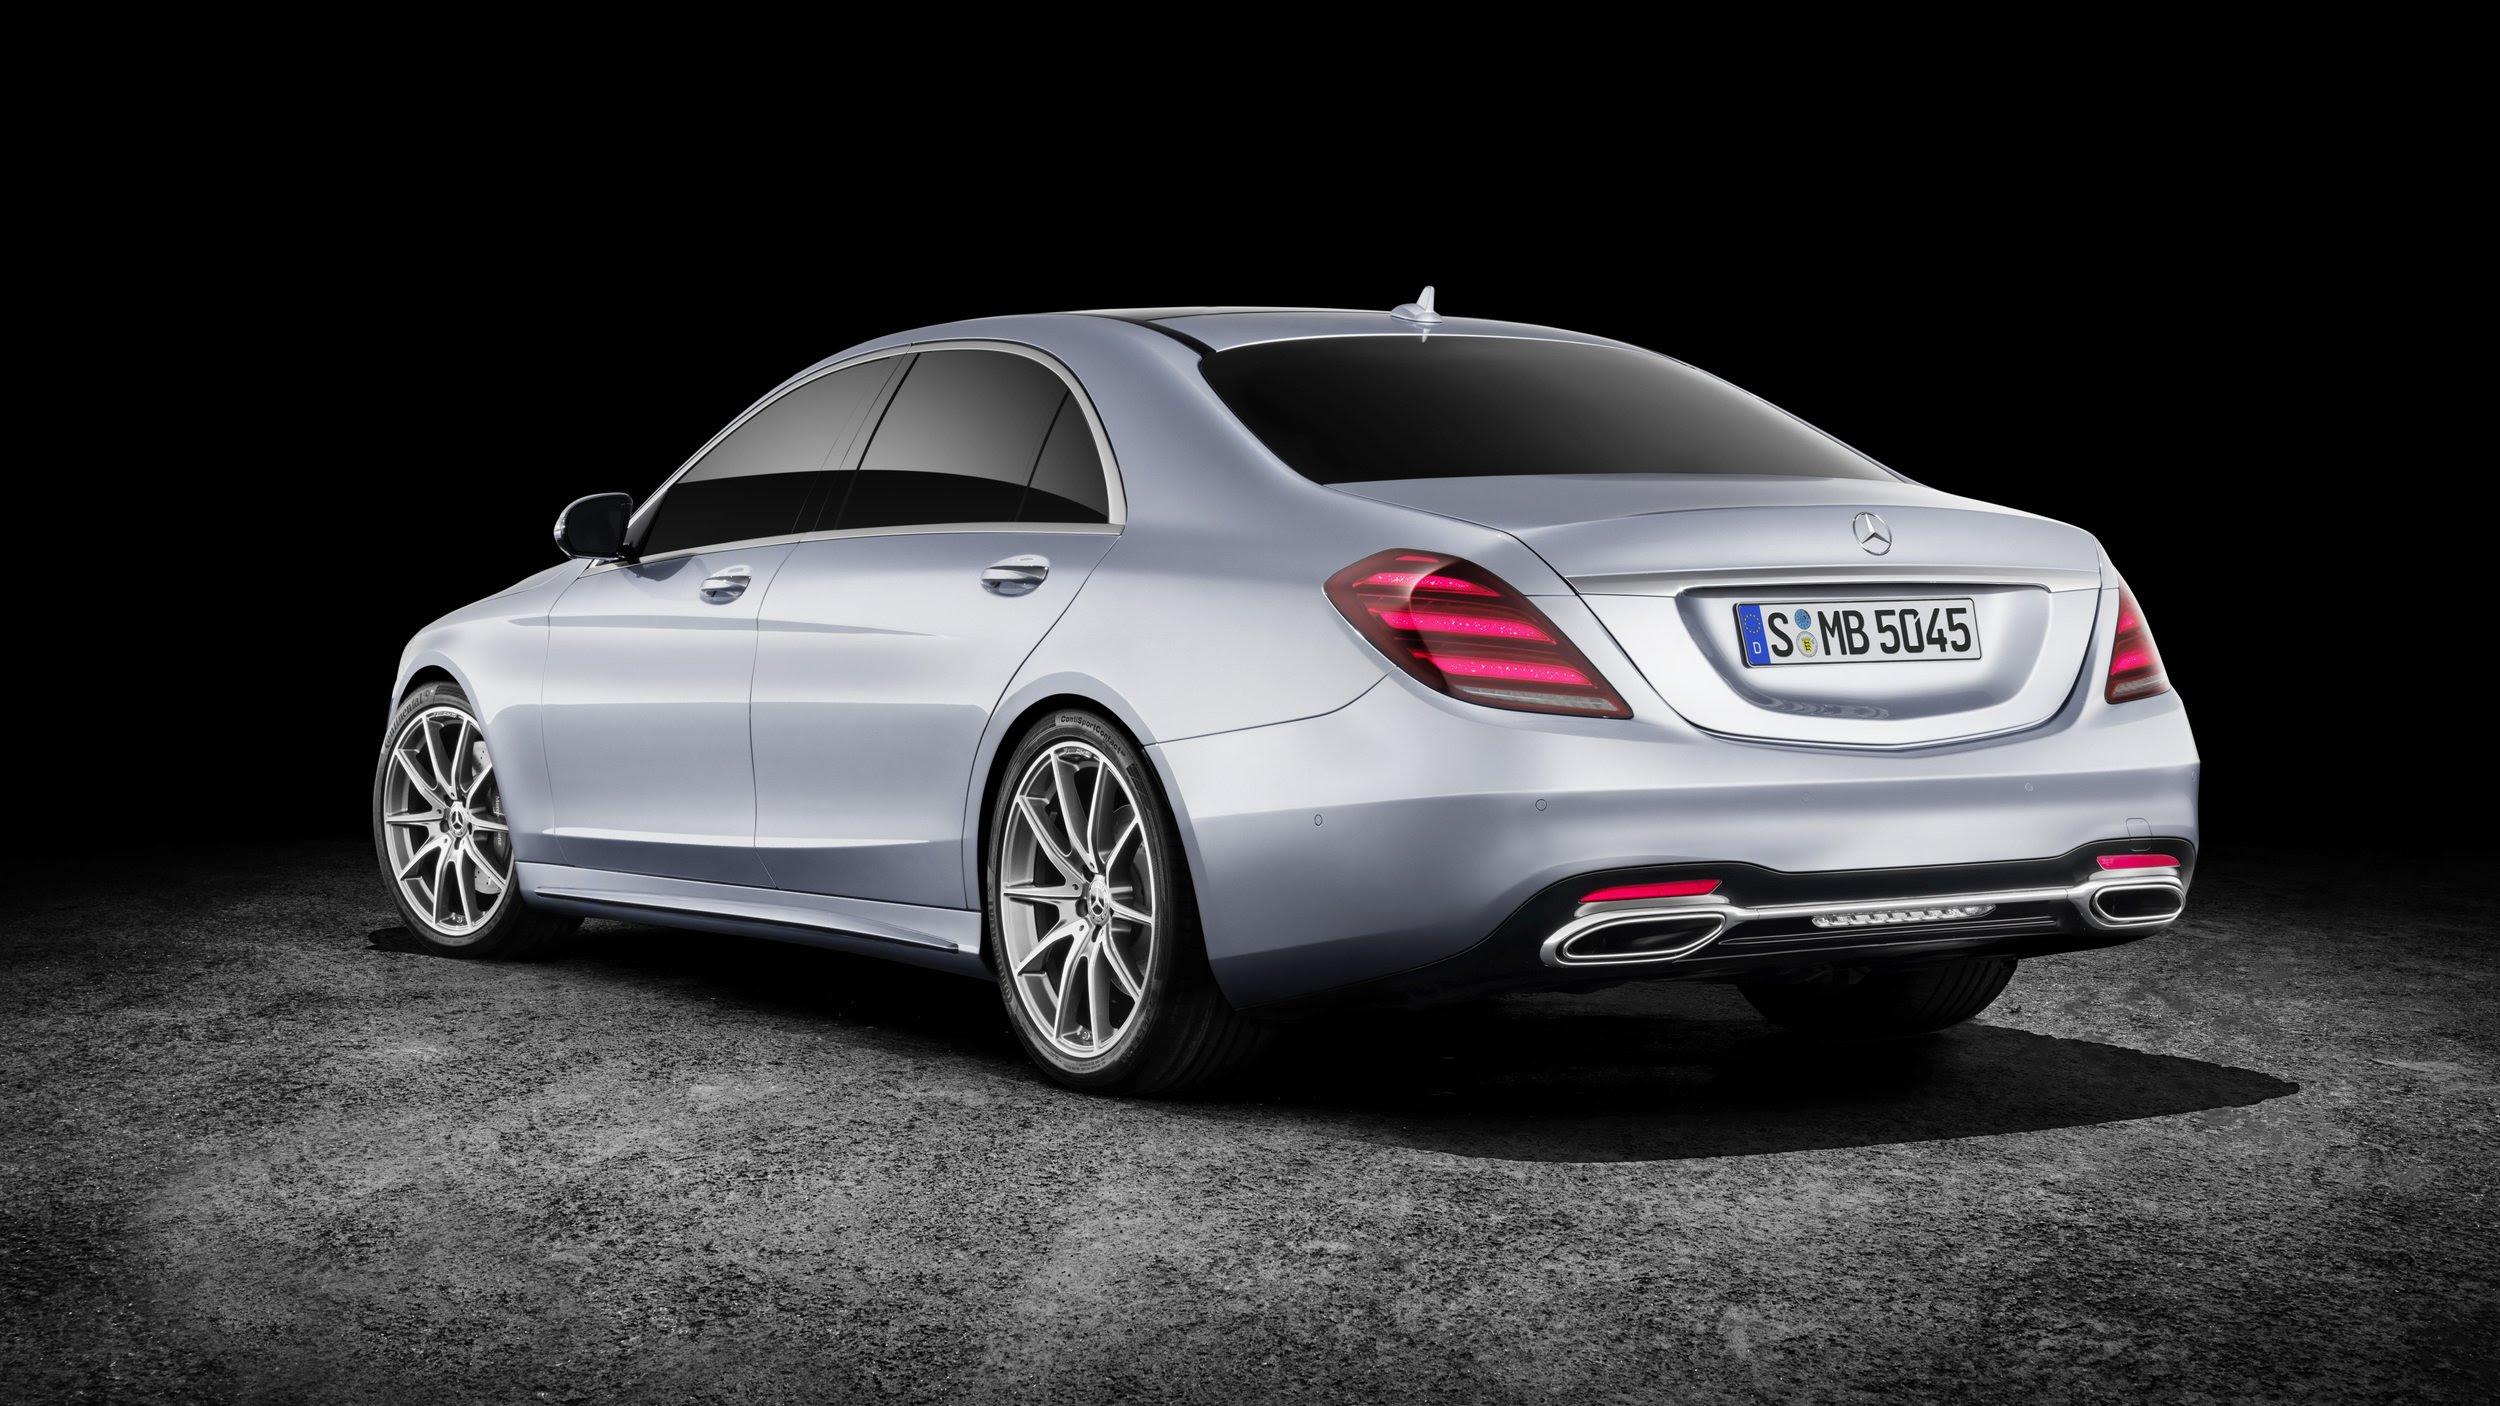 2018 Mercedes-Benz S-Class - Photos, Details, Specifications